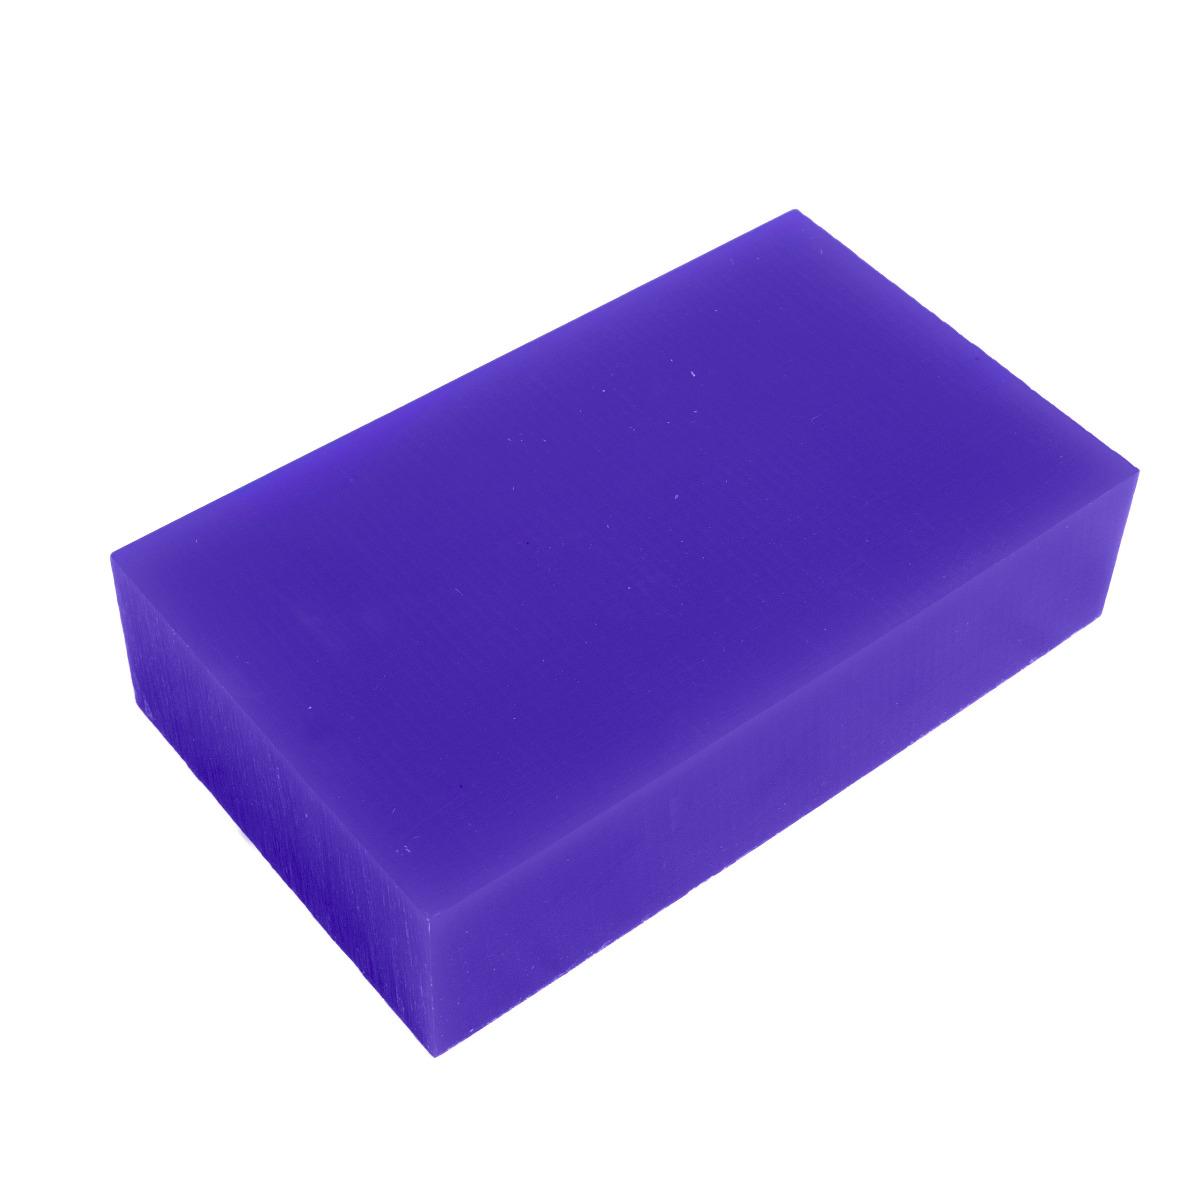 "File-A-Wax Block - Blue - Carving Wax 1lb Box 3-5/8"" x 6"" x 1-1/2"" Thick"